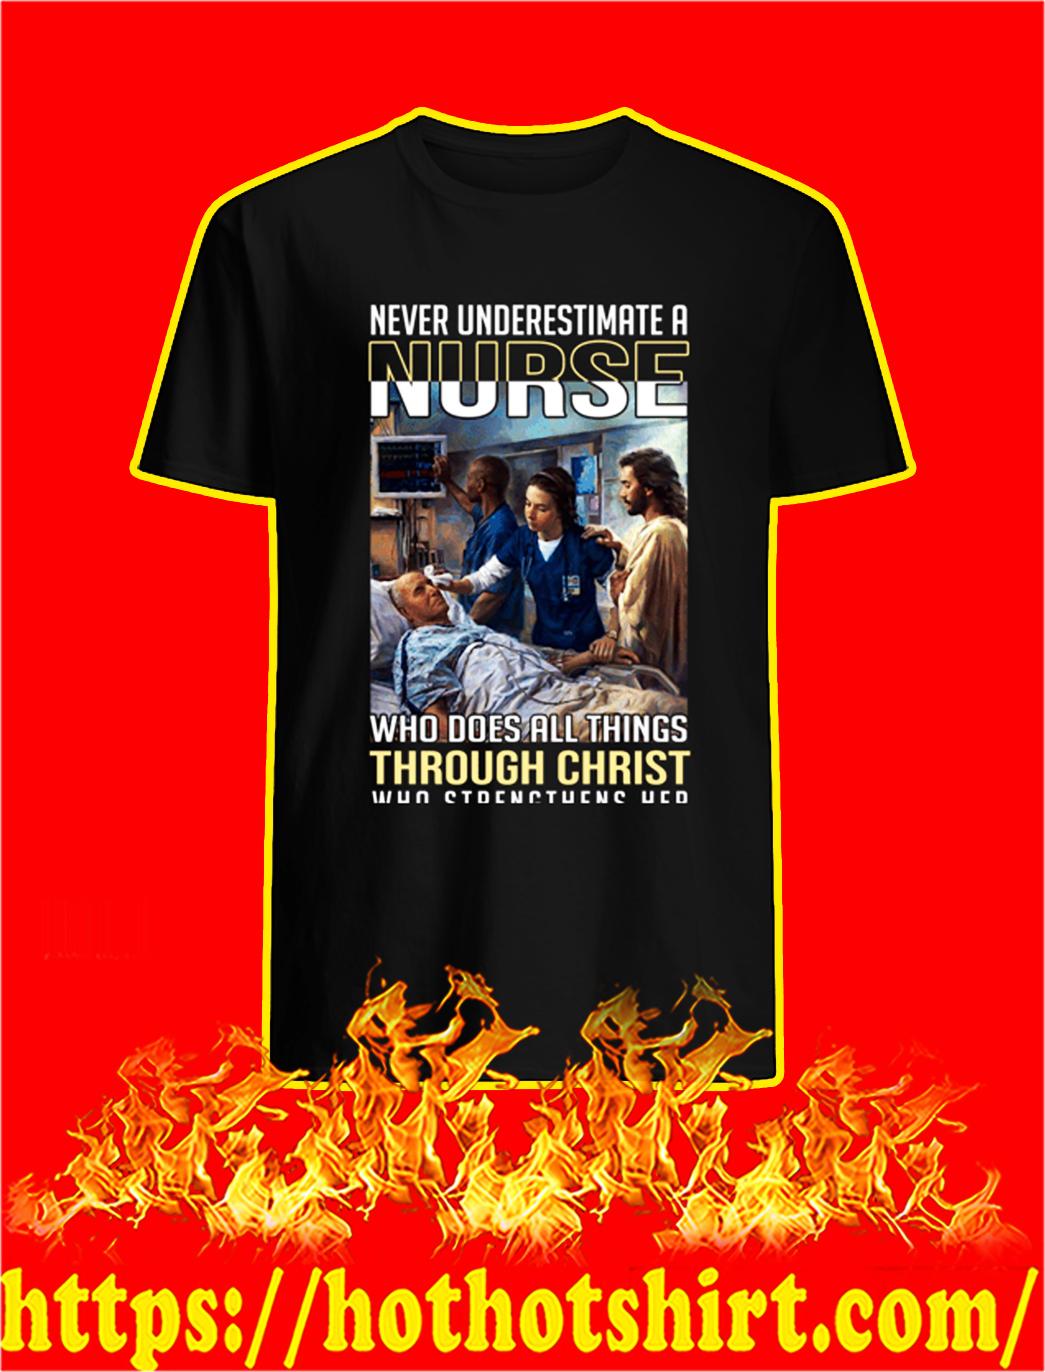 Coronavirus Never underestimate a nurse shirt